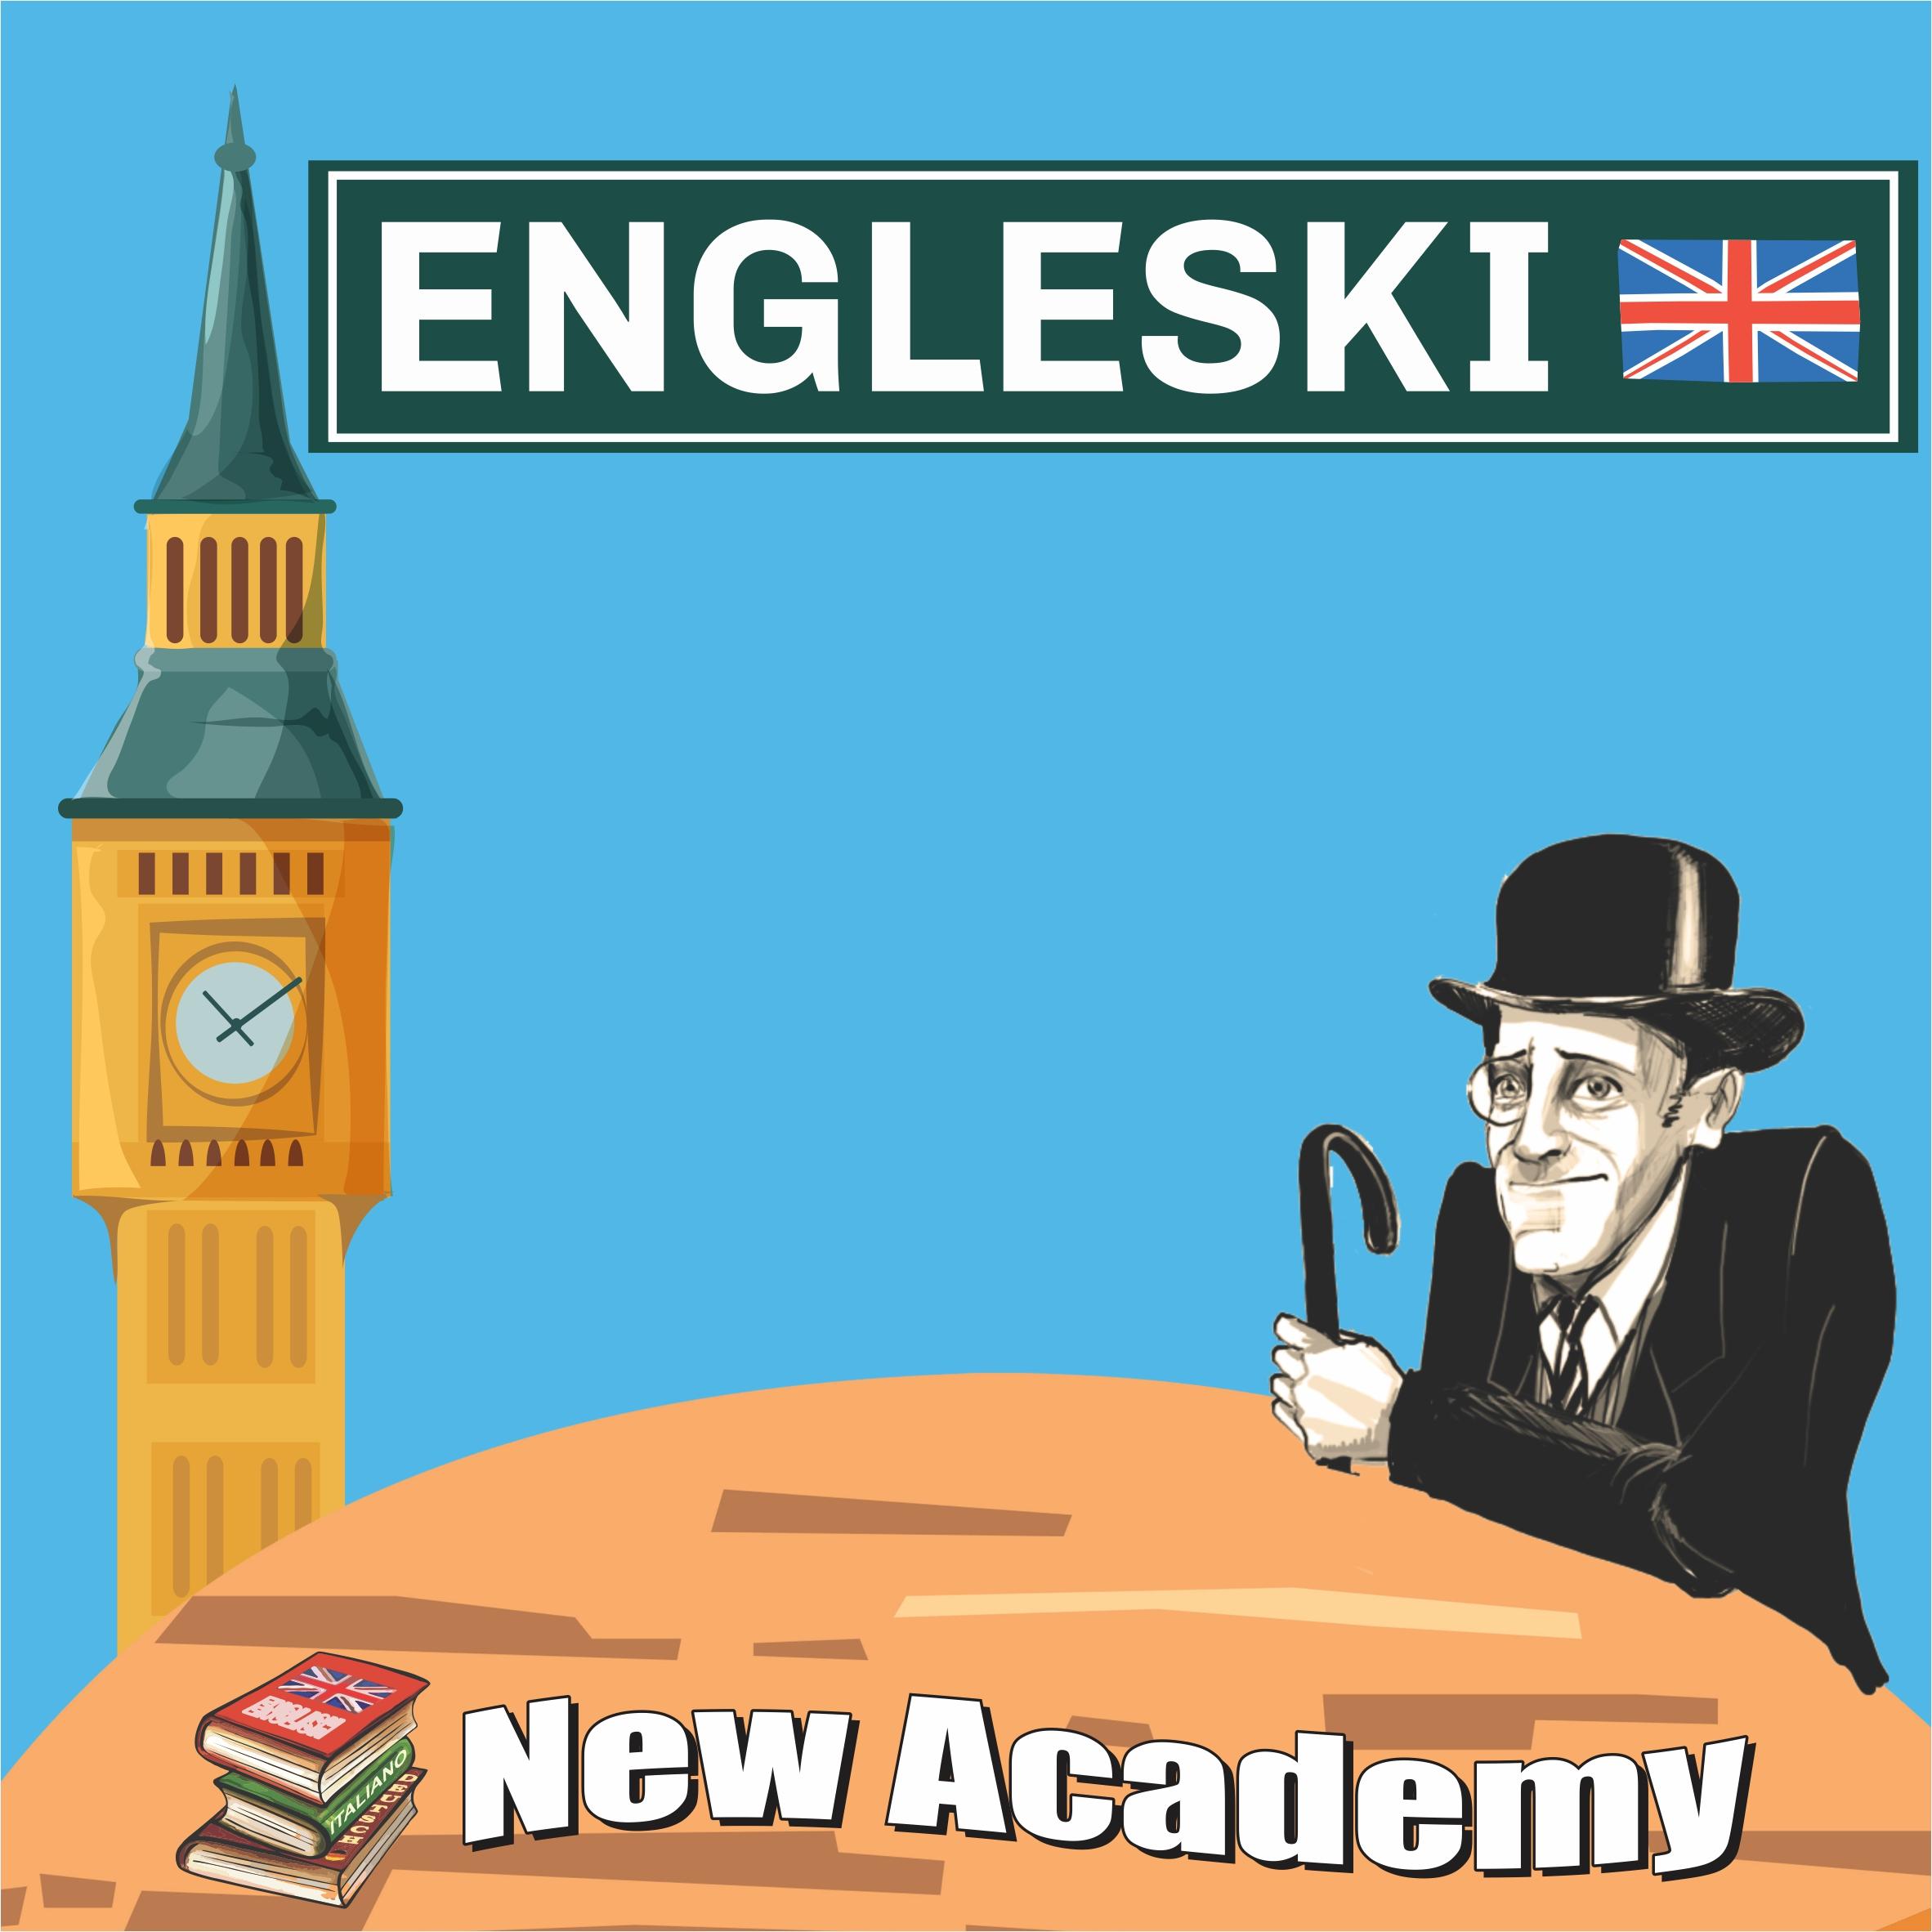 engleski ikonica web site